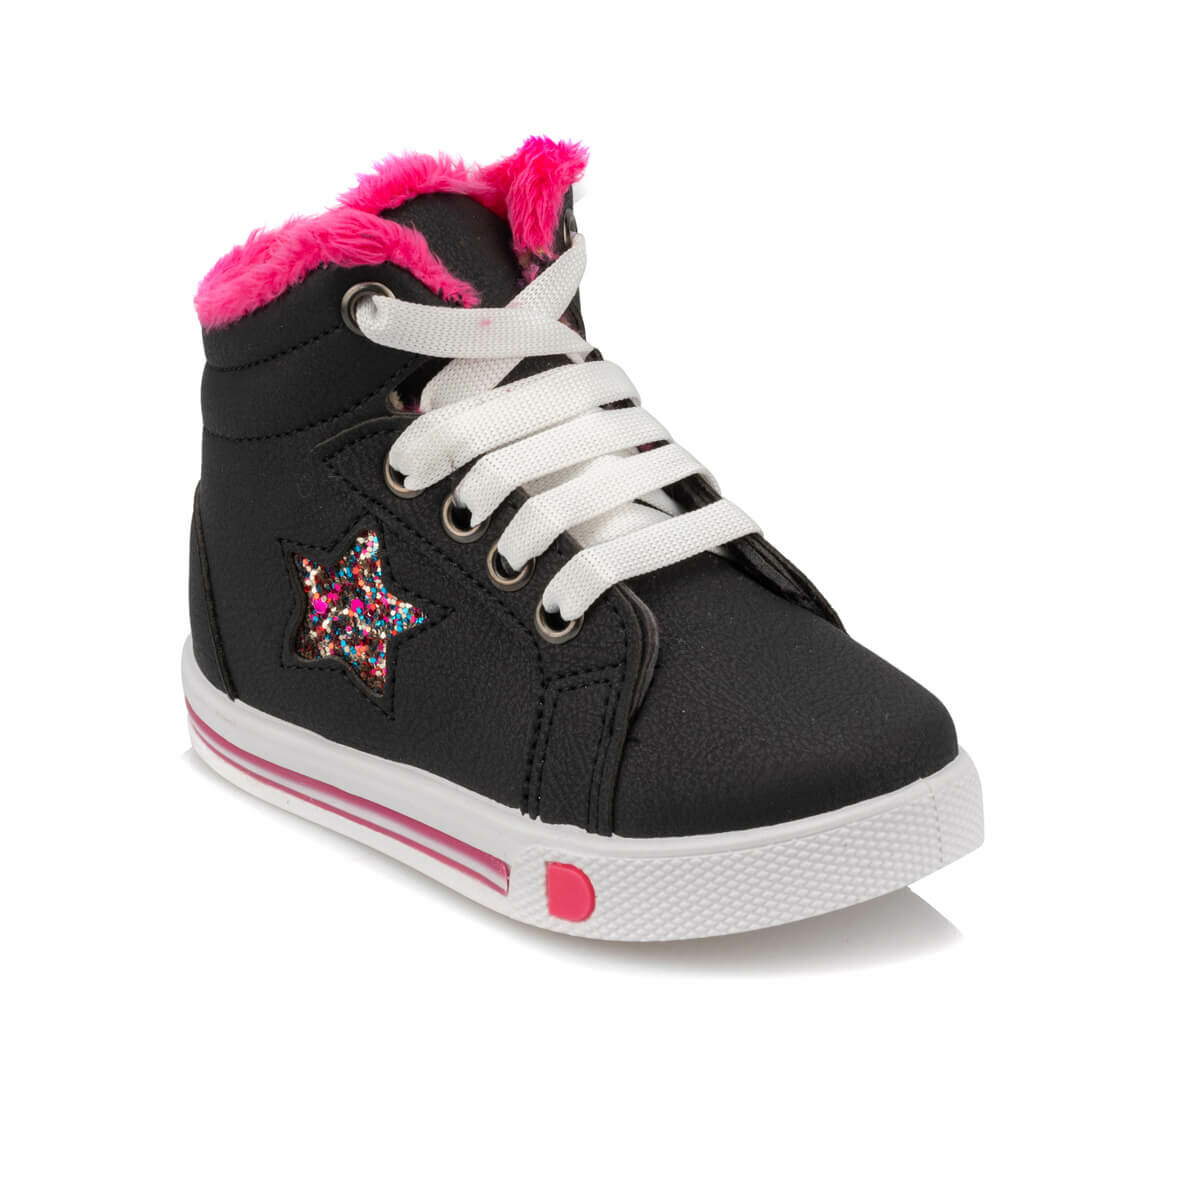 FLO 92.510832.B Black Female Child Boots Polaris